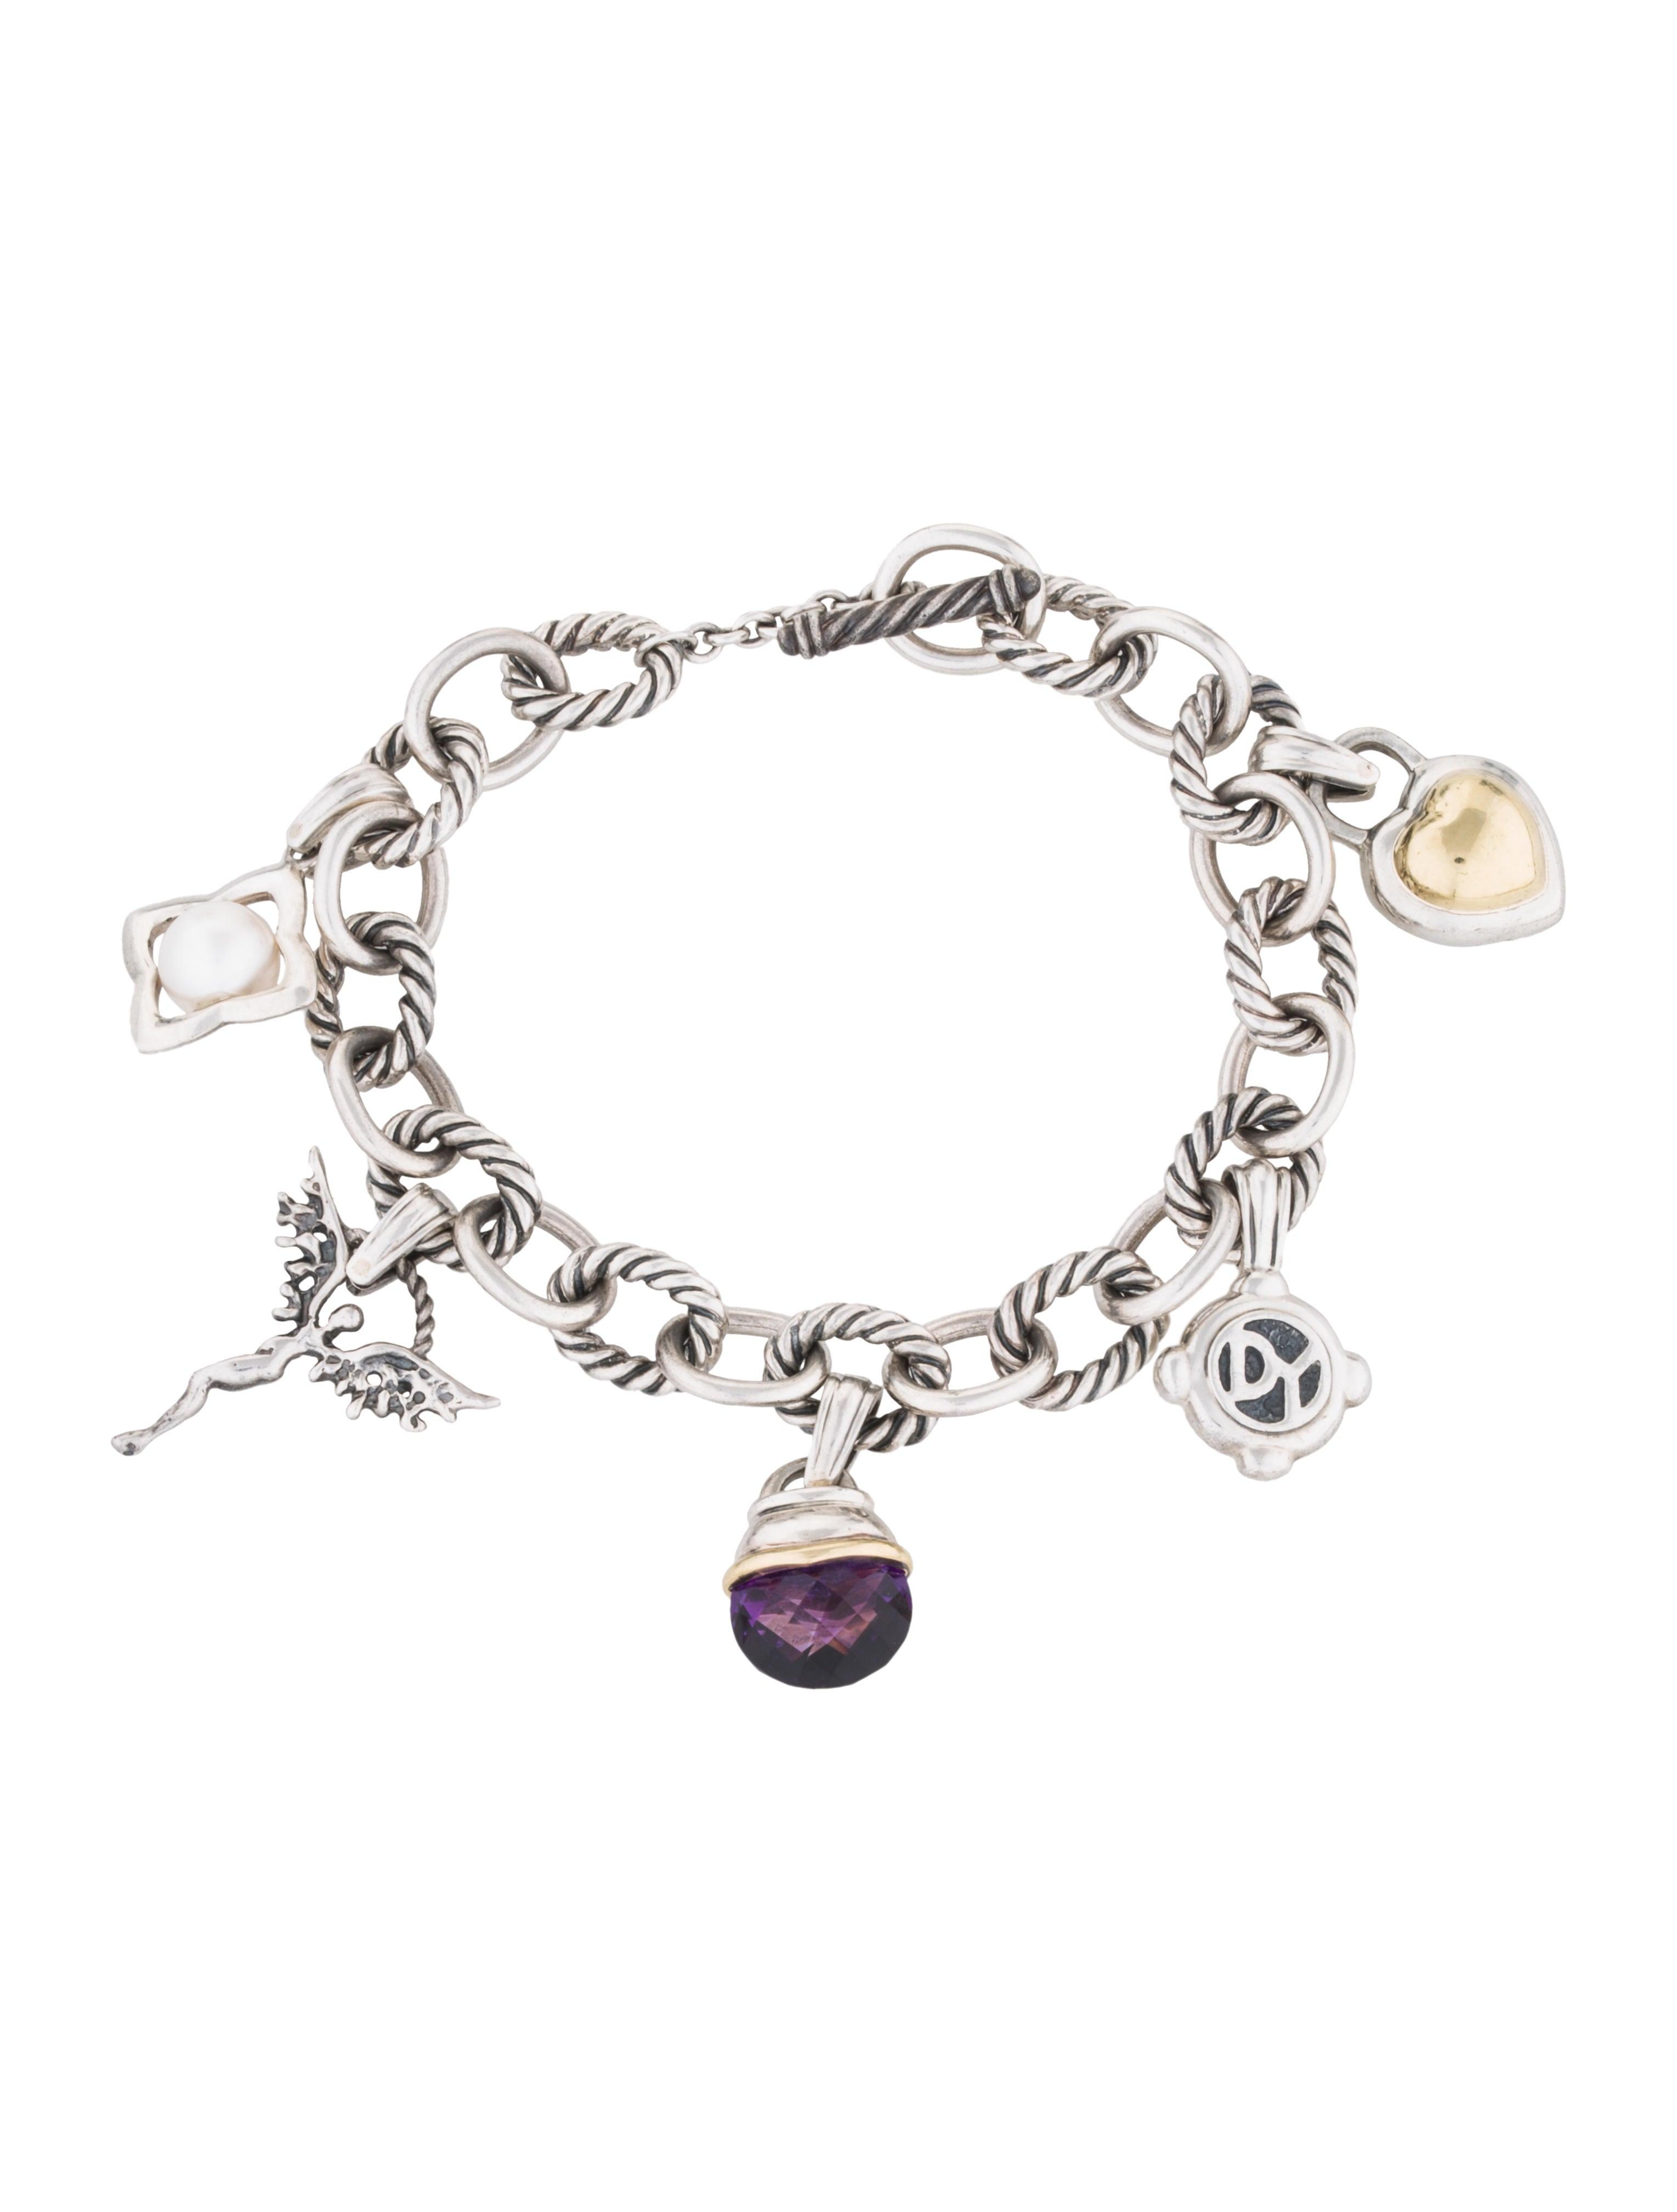 David Yurman Pearl & Amethyst Charm Bracelet